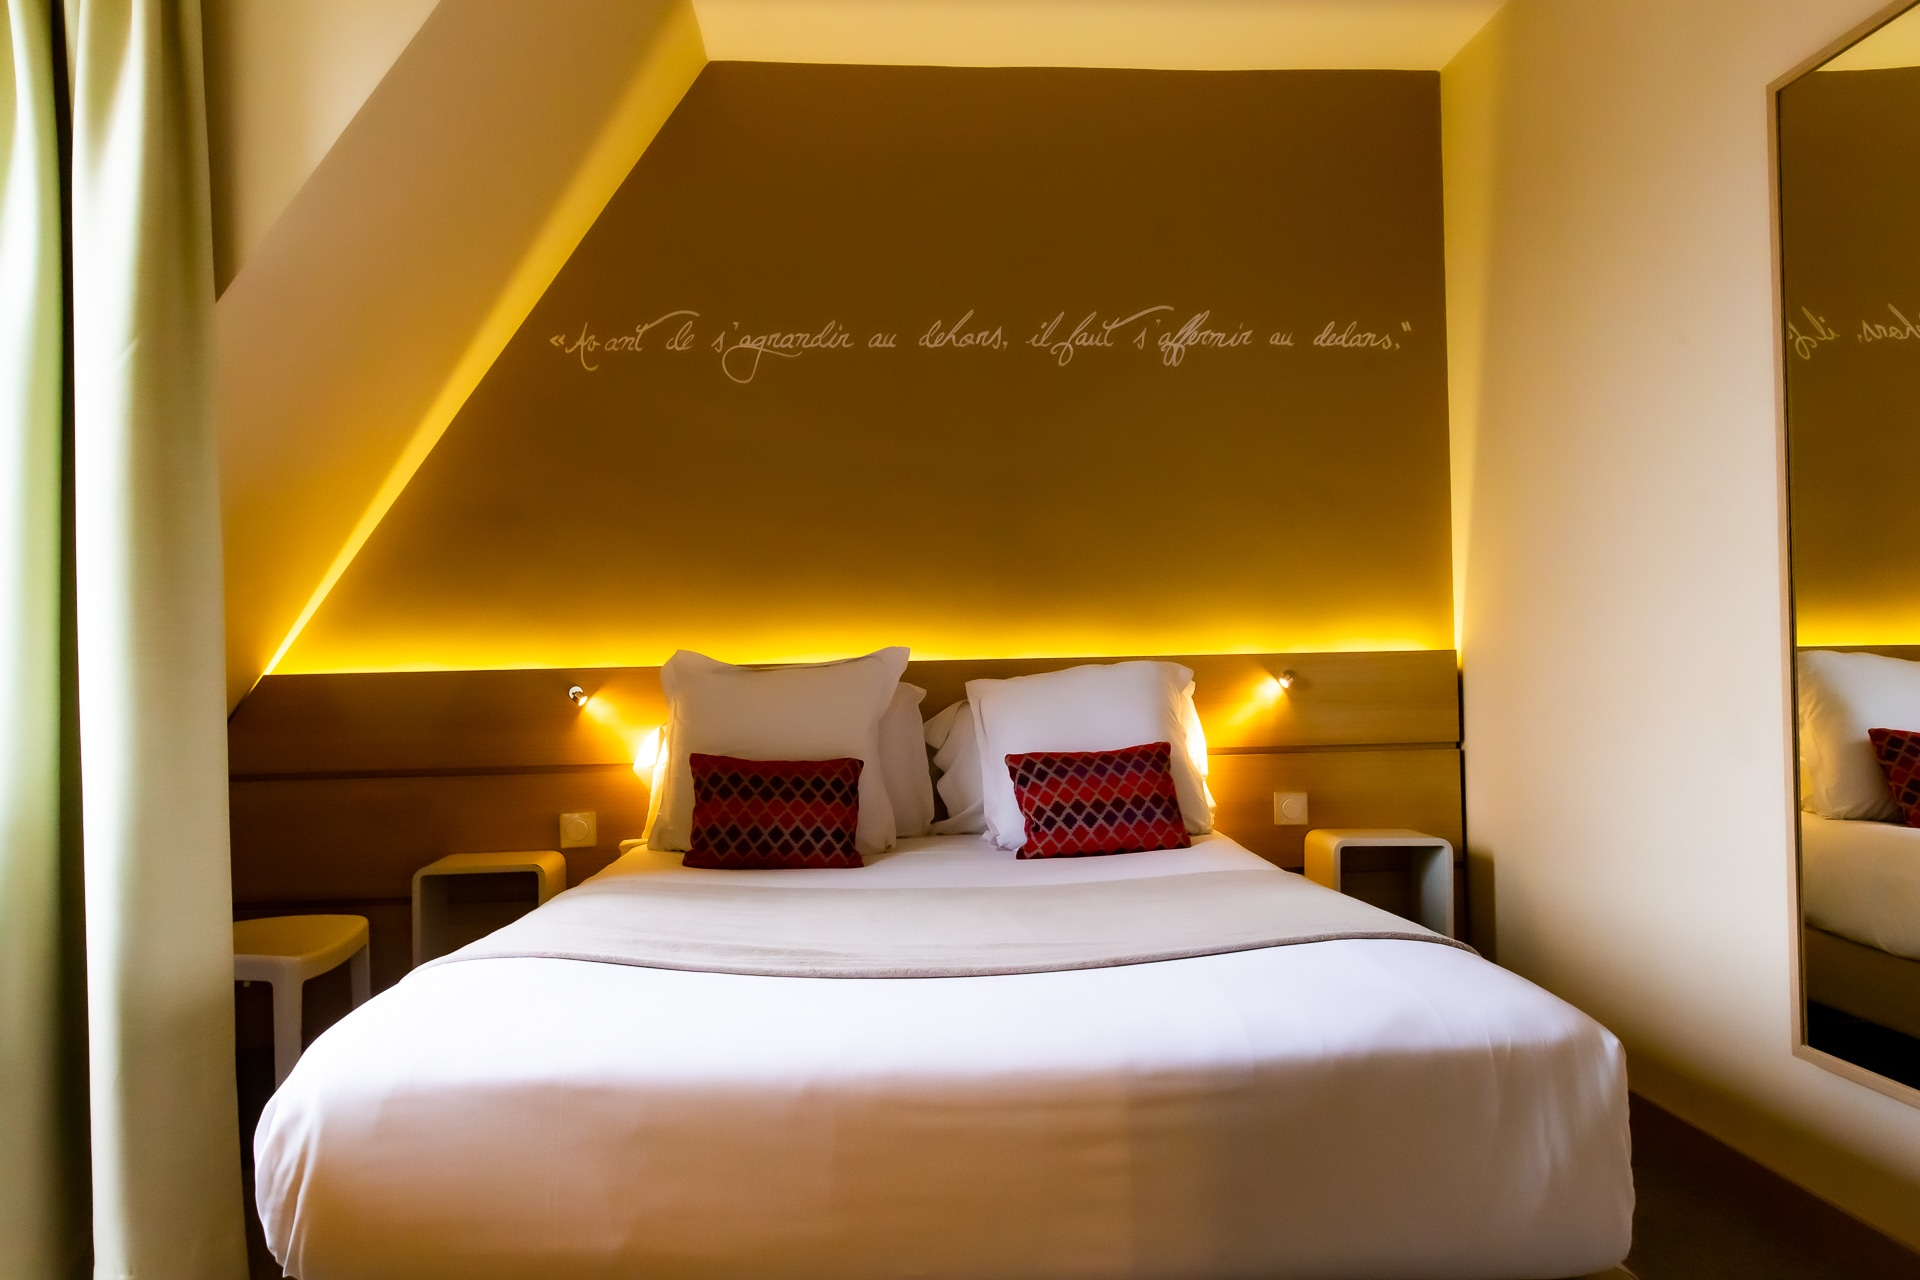 hotel_chateau_dinan©Stephane Leroy-2486